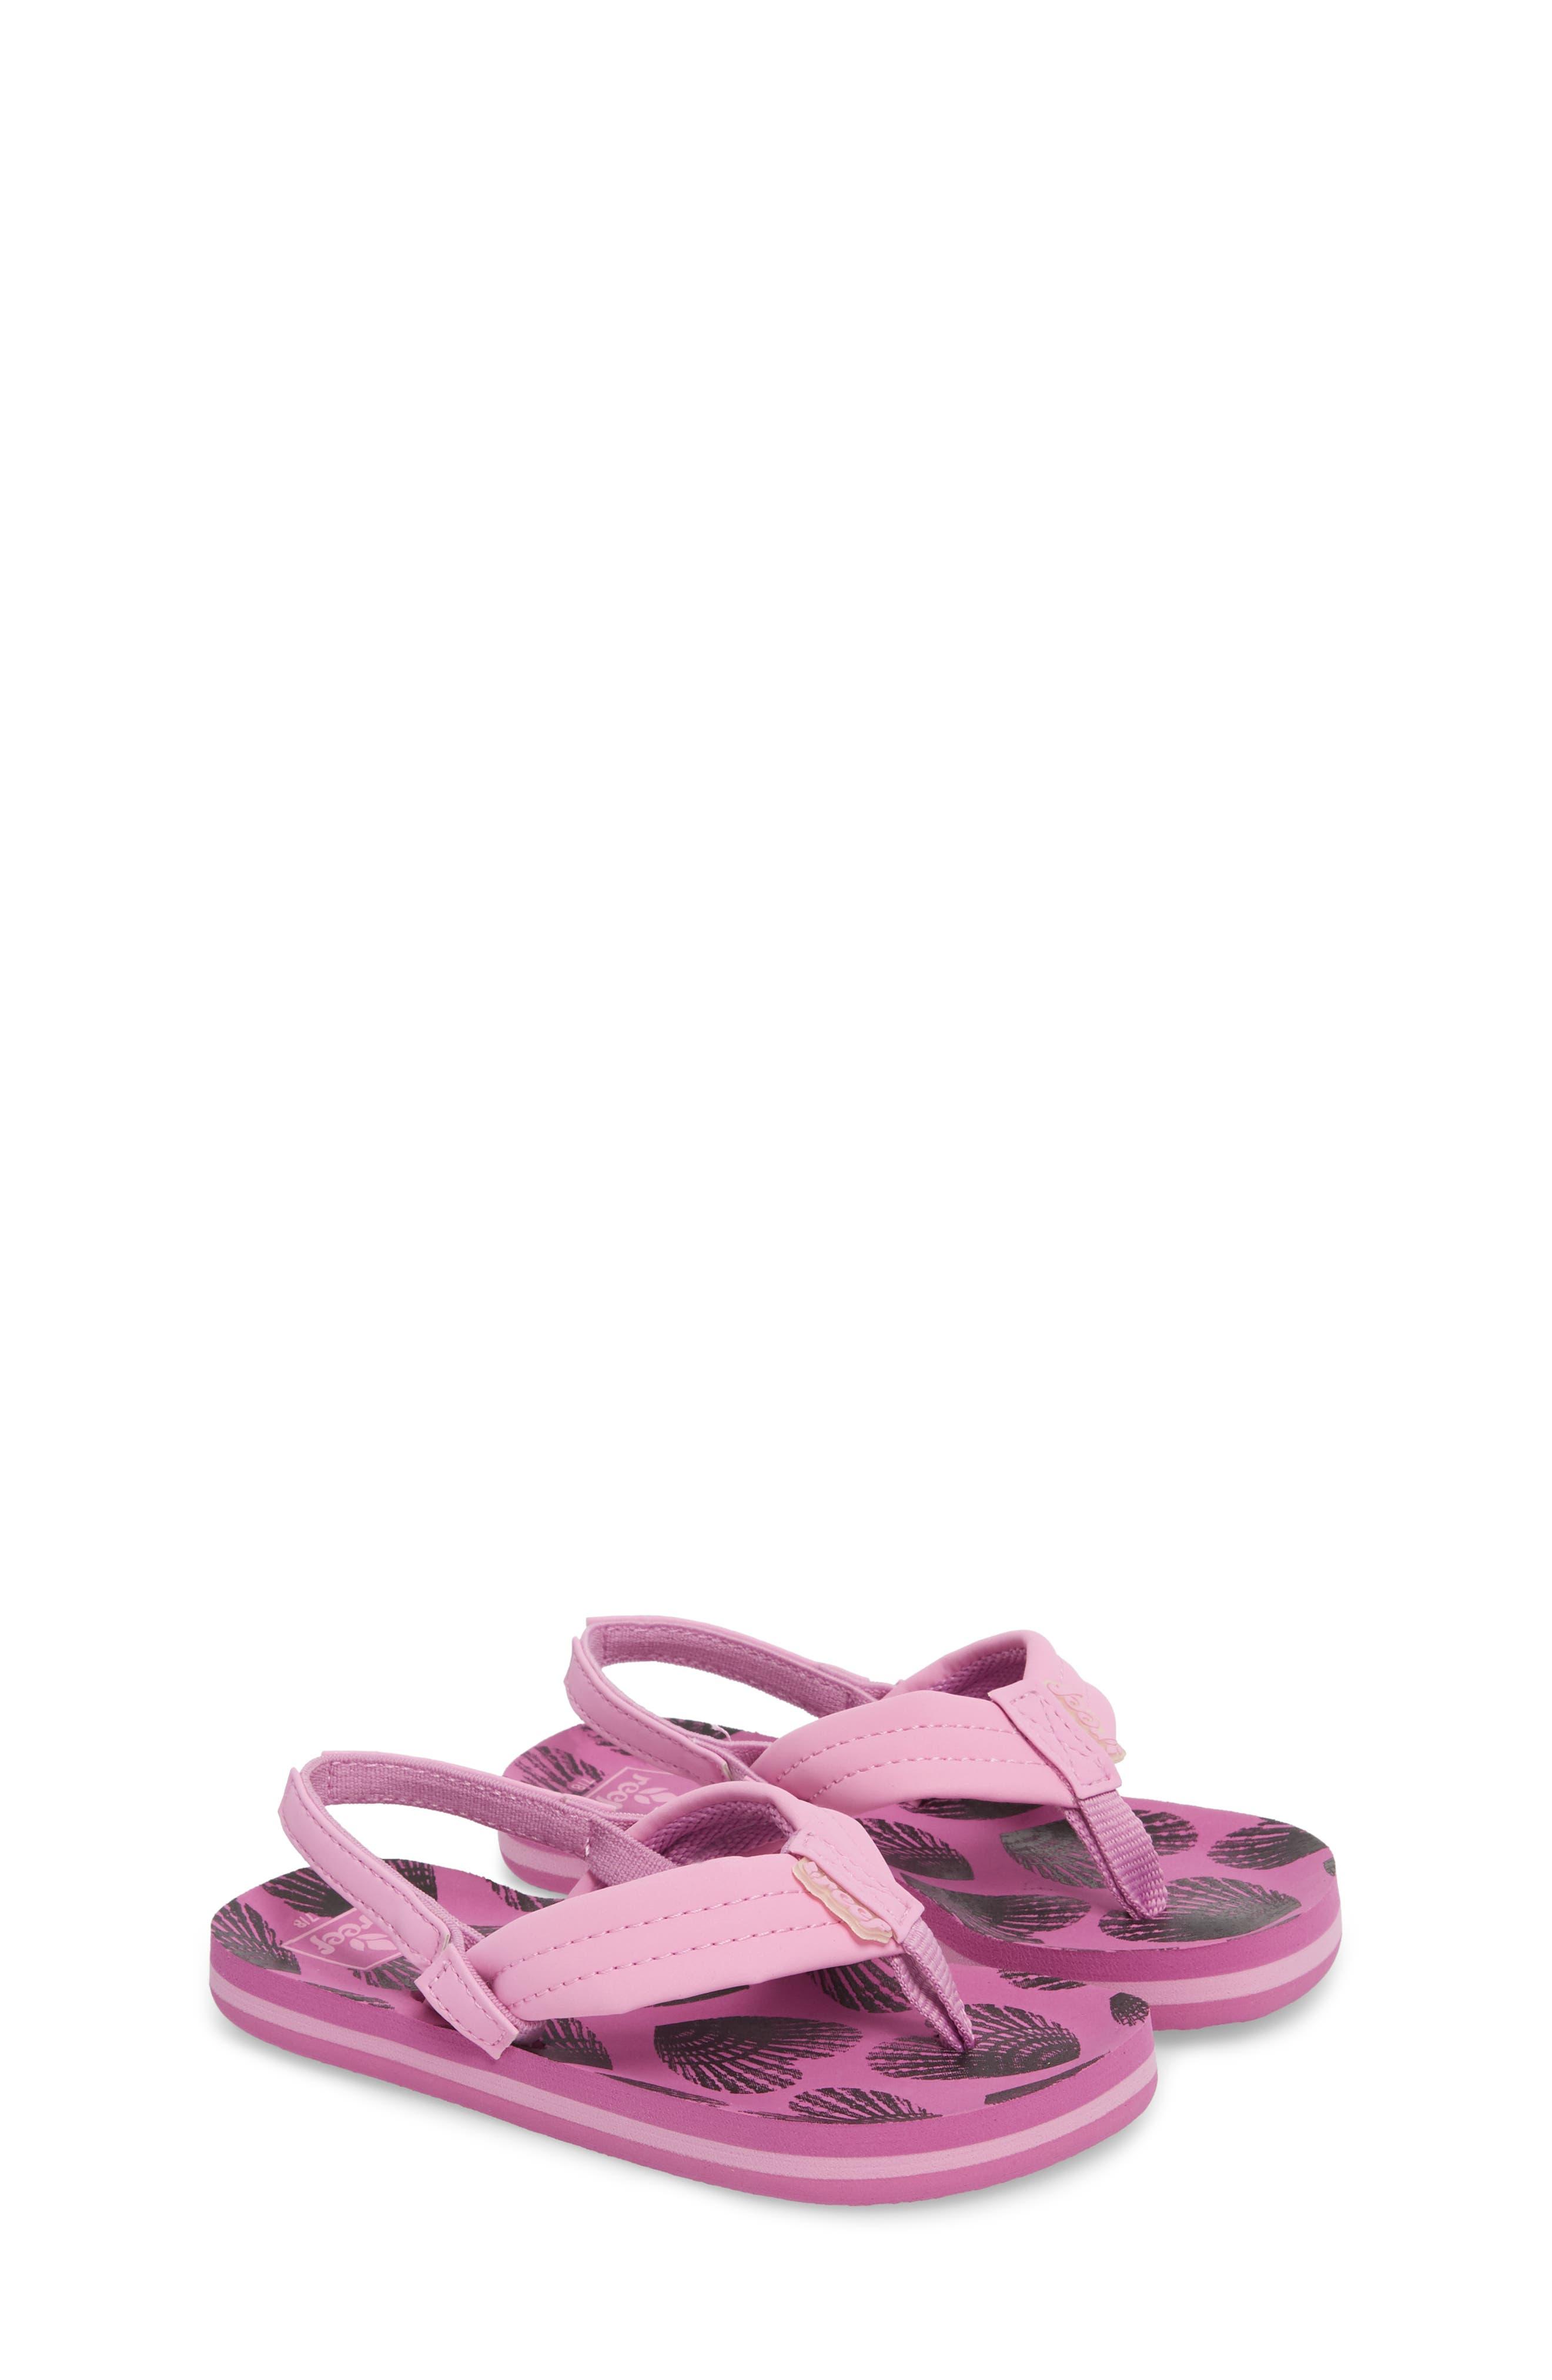 Little Ahi Sandal,                             Alternate thumbnail 3, color,                             Purple